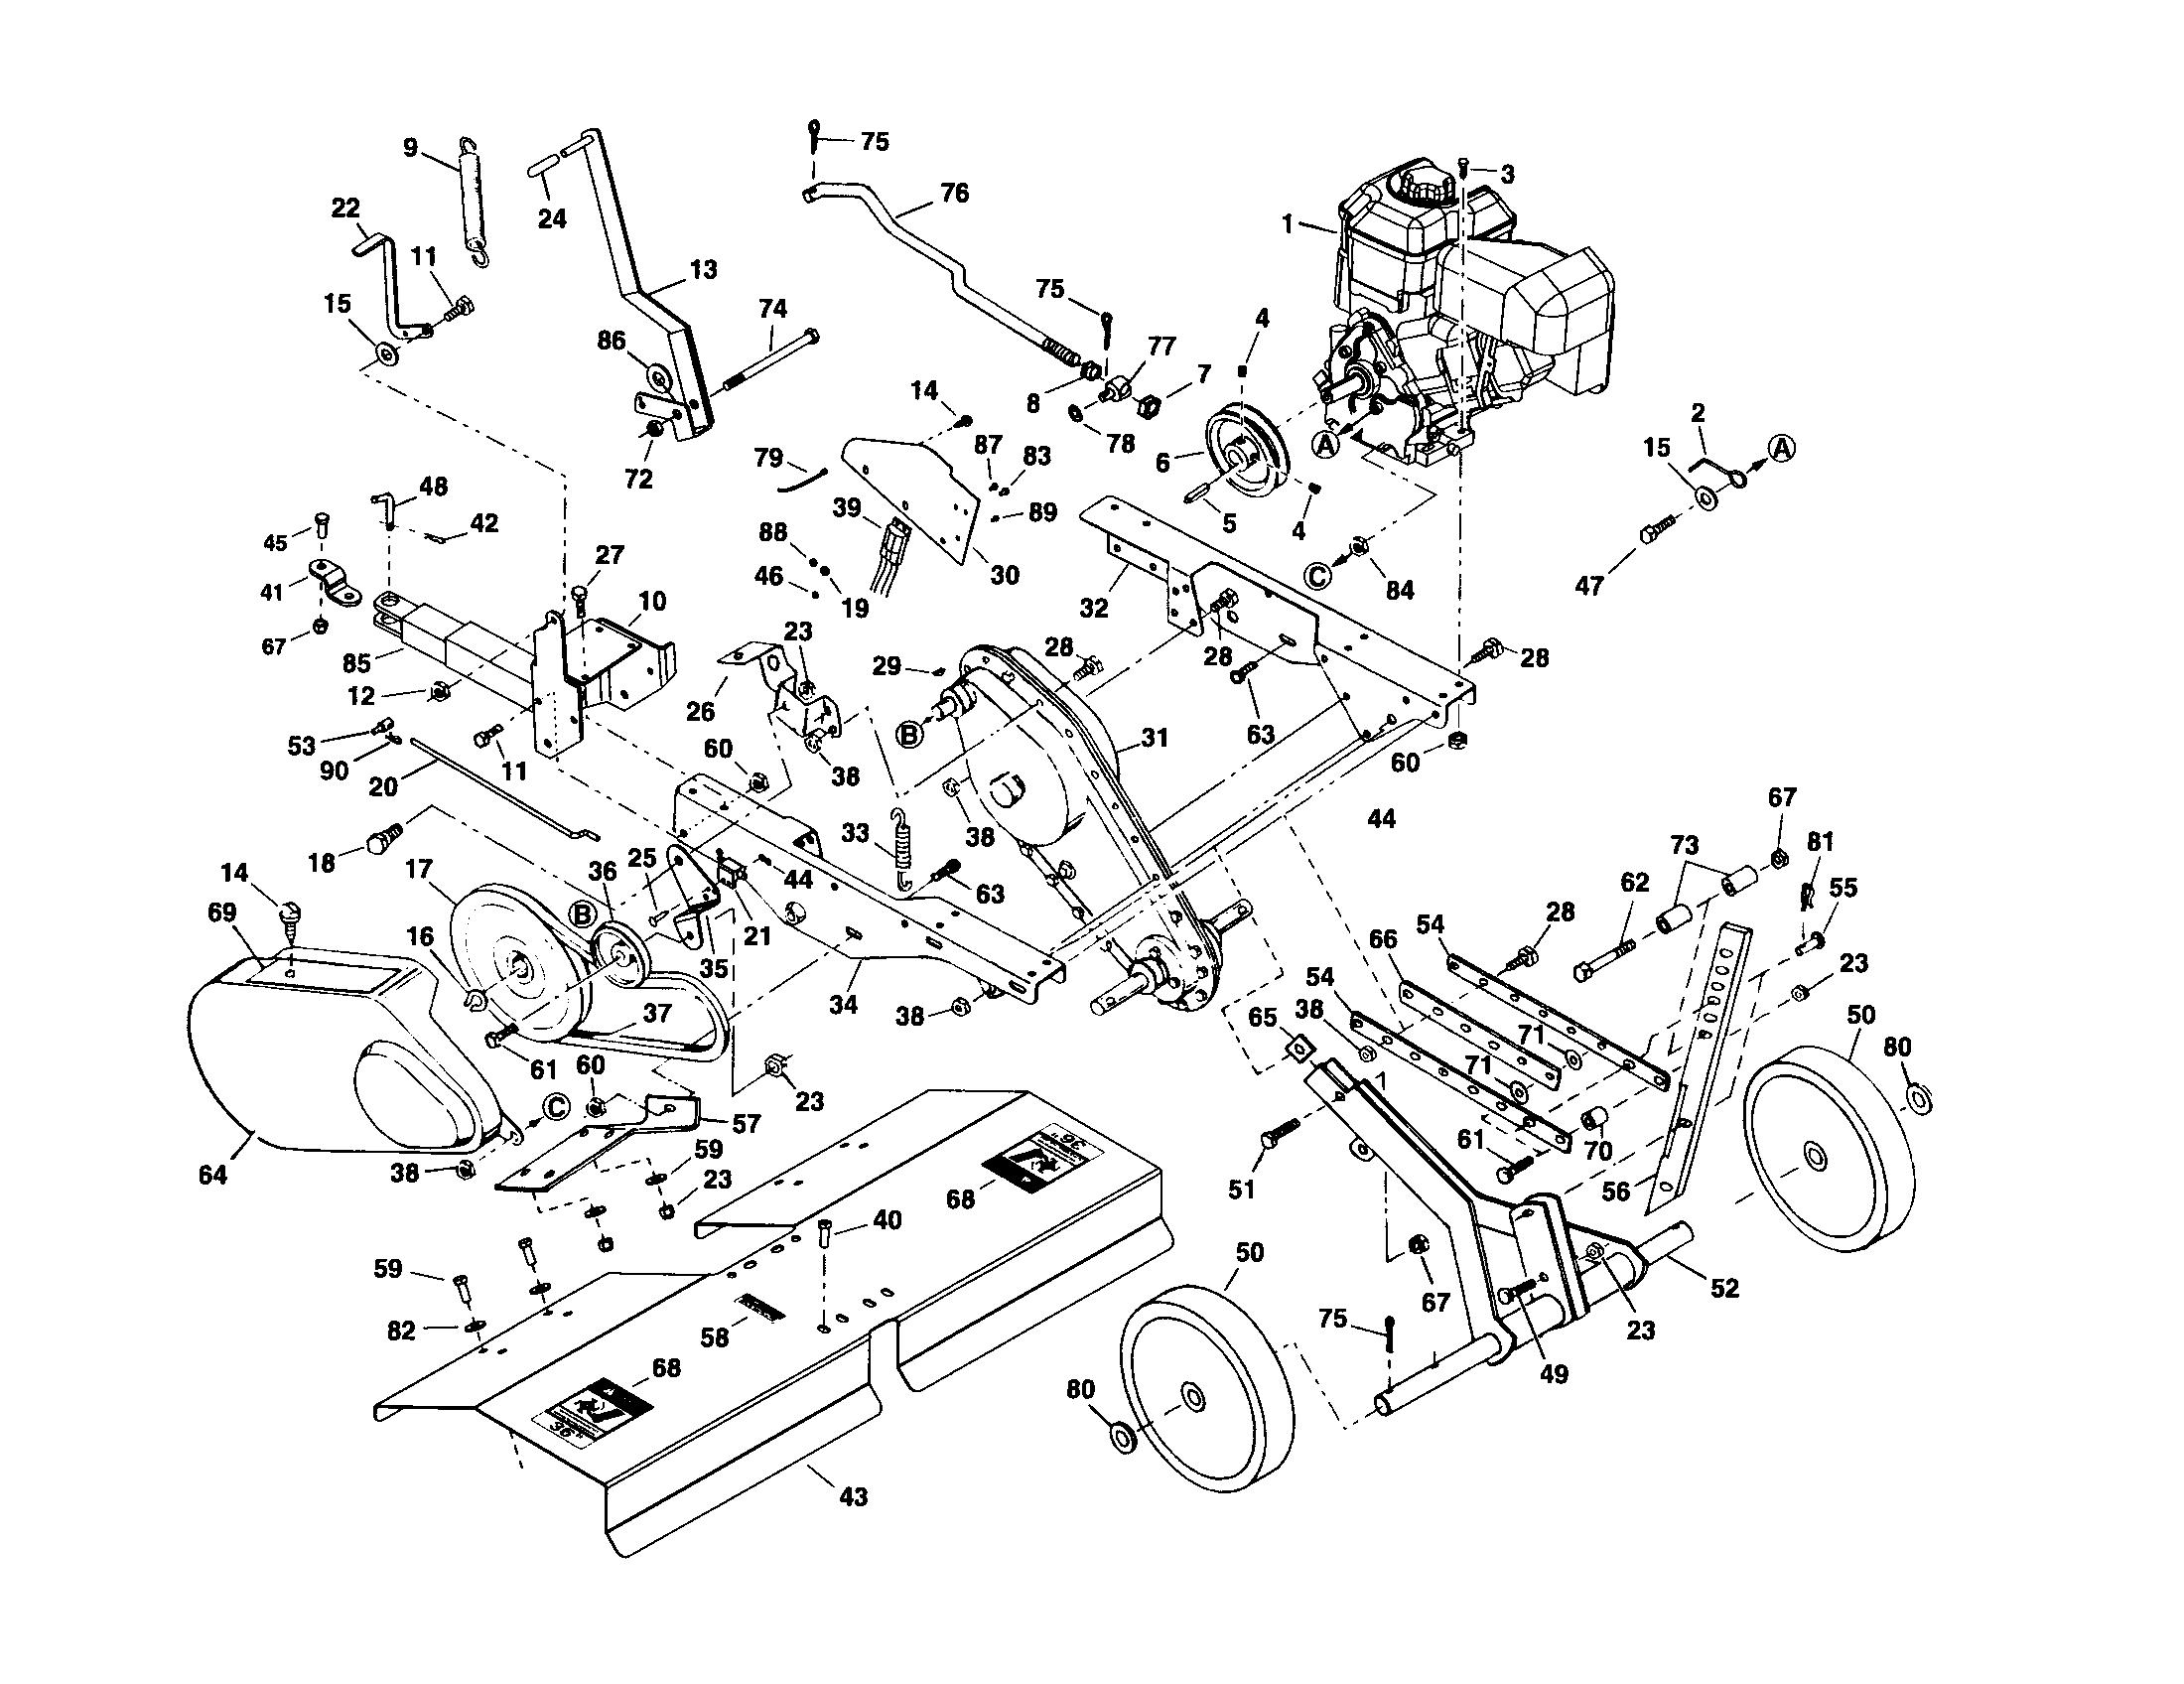 [ZSVE_7041]  LF_5018] Wiring Diagram Diagram And Parts List For Roper Dishwasherparts  Model Download Diagram   Roper Tractor Wiring Diagram      Funi Wigeg Mohammedshrine Librar Wiring 101